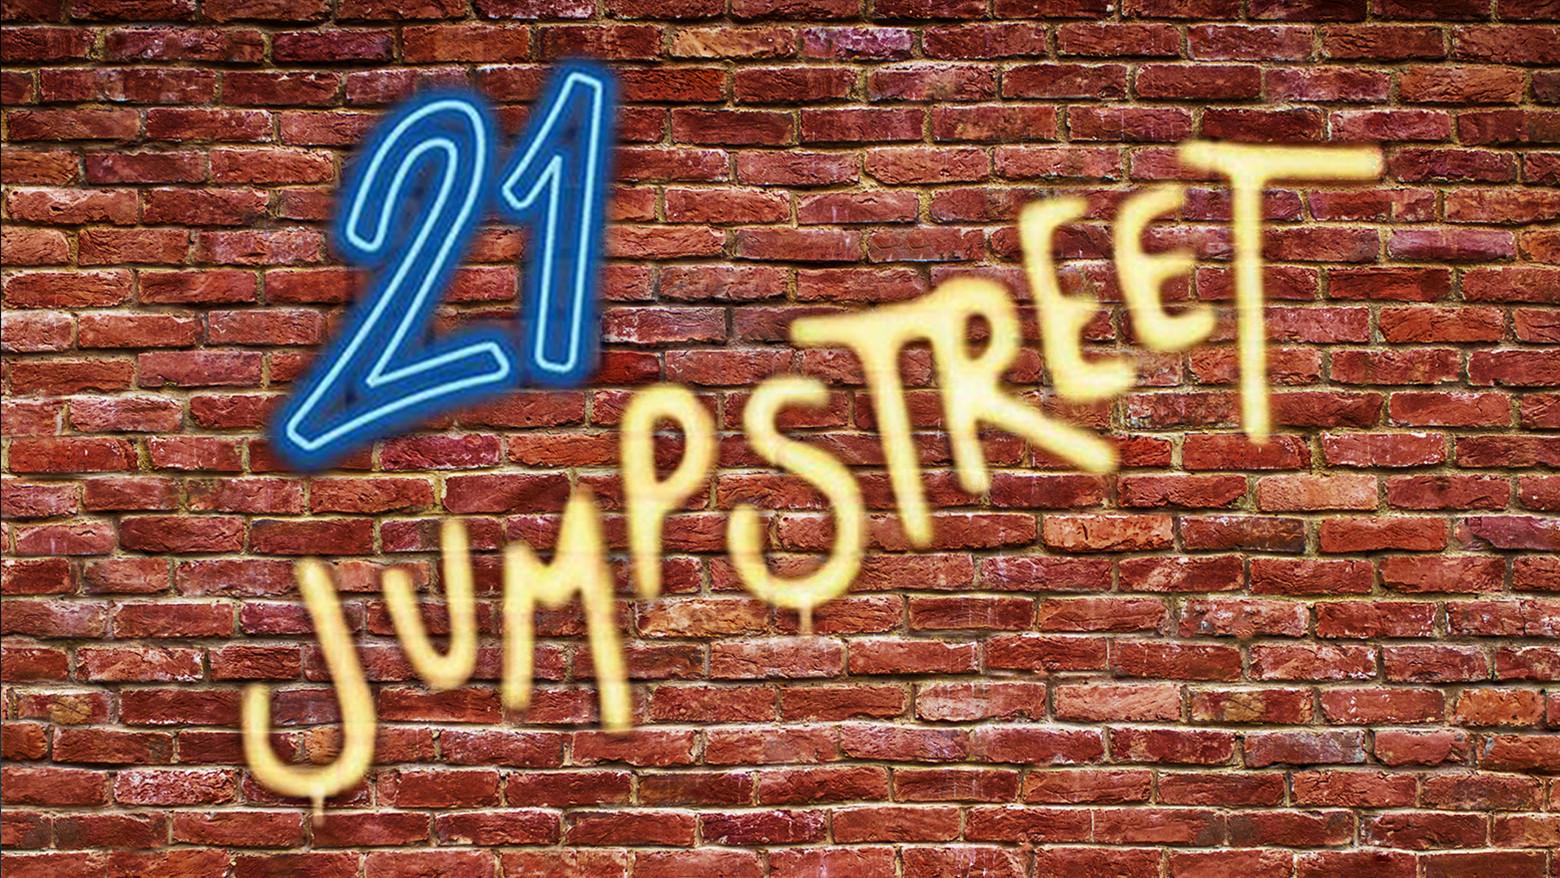 21 Jumpstreet_featuredImage.jpg